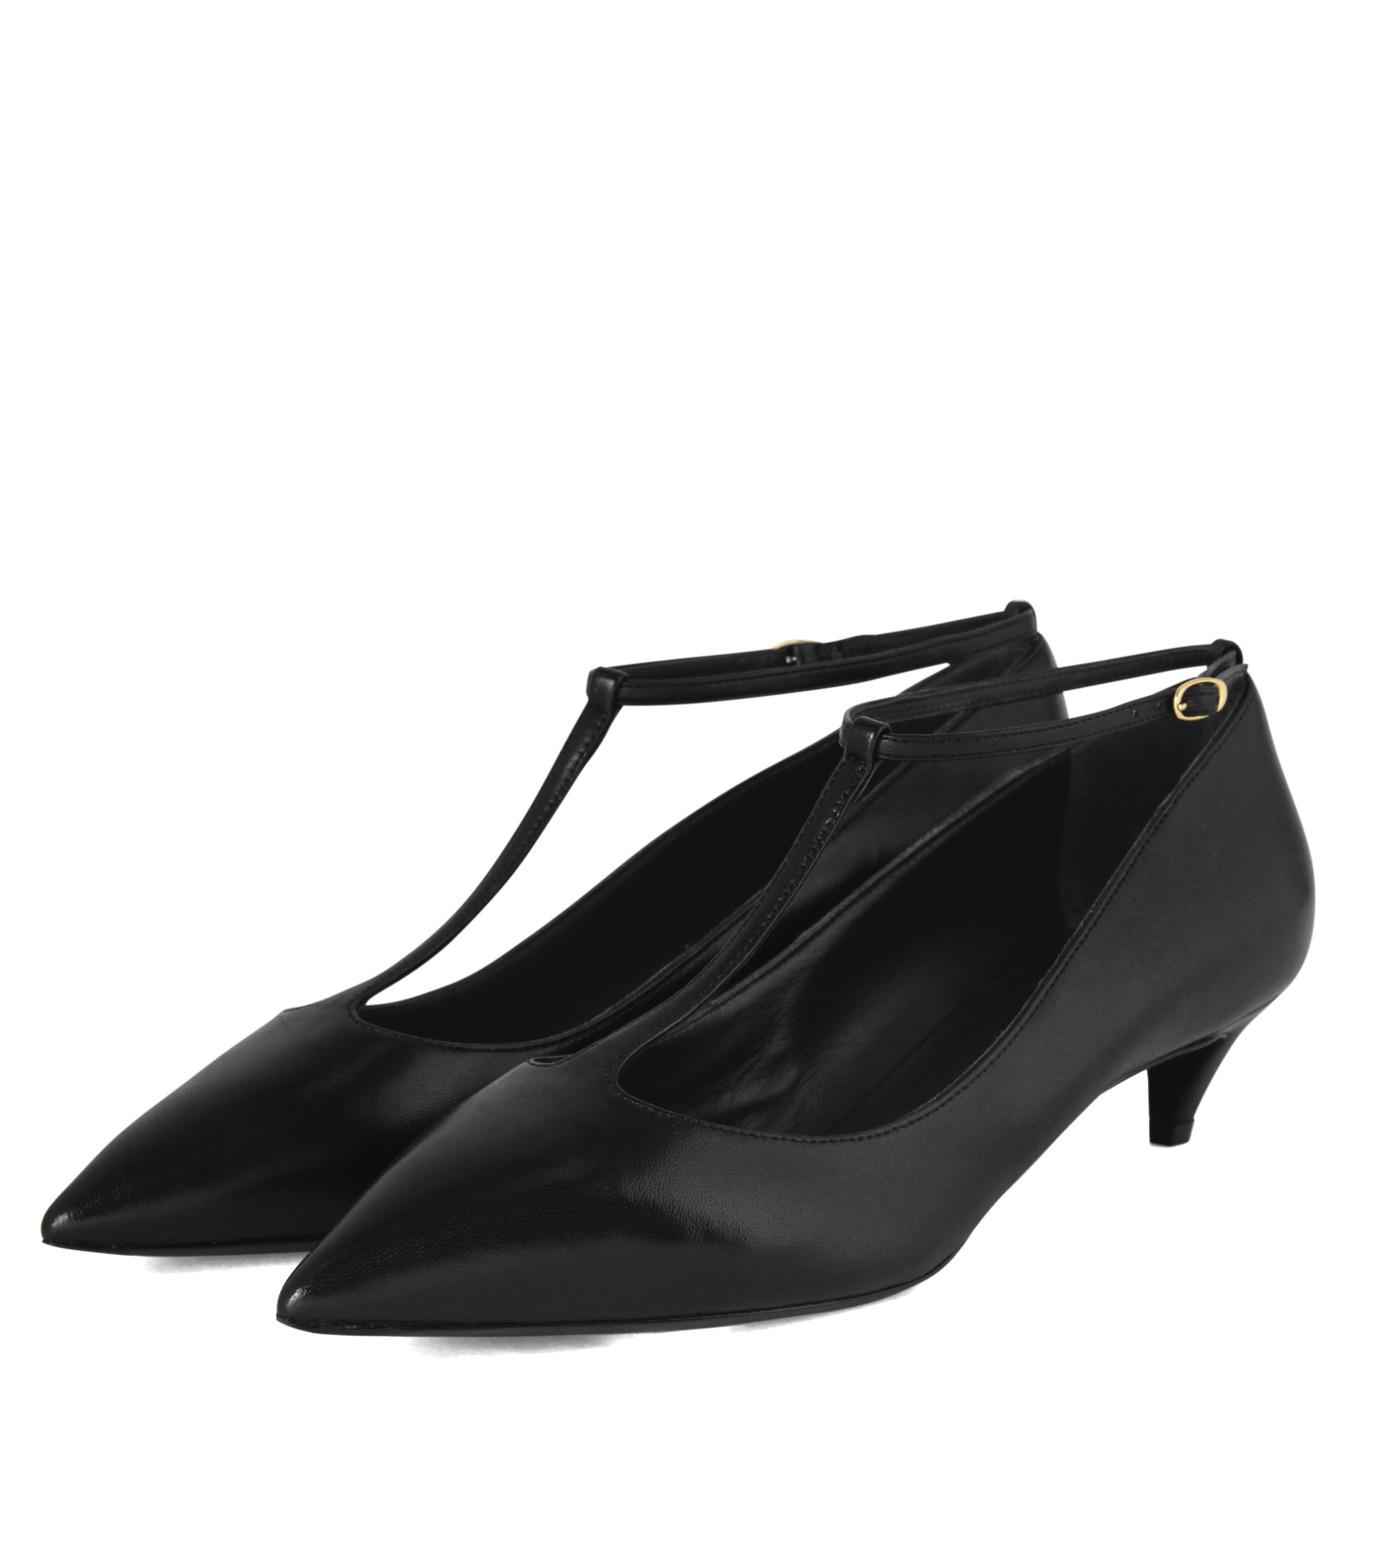 Giuseppe Zanotti Design(ジュゼッペザノッティ)のKitten Heel T-Strap Pump-BLACK(シューズ/shoes)-42-6082NP035-13 拡大詳細画像3